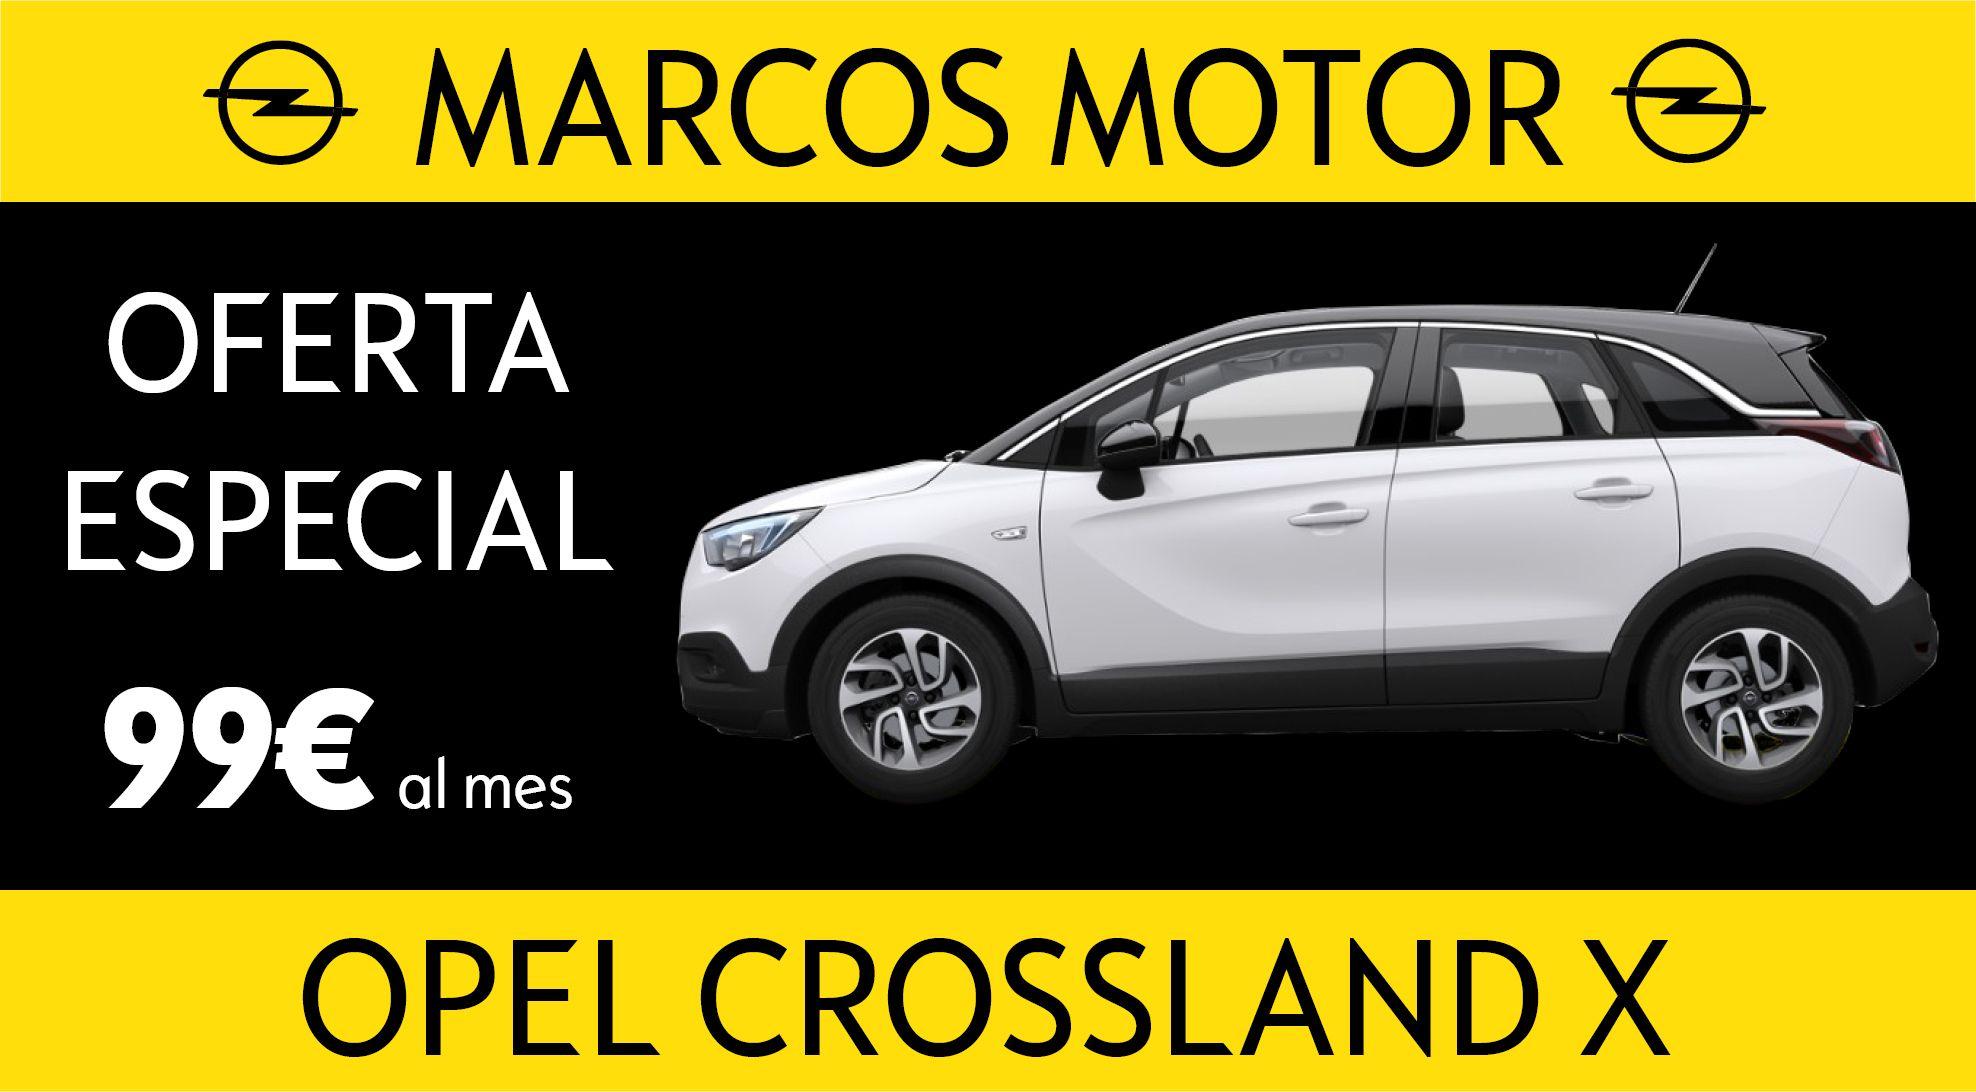 Opel Crossland Offer € 99 per month